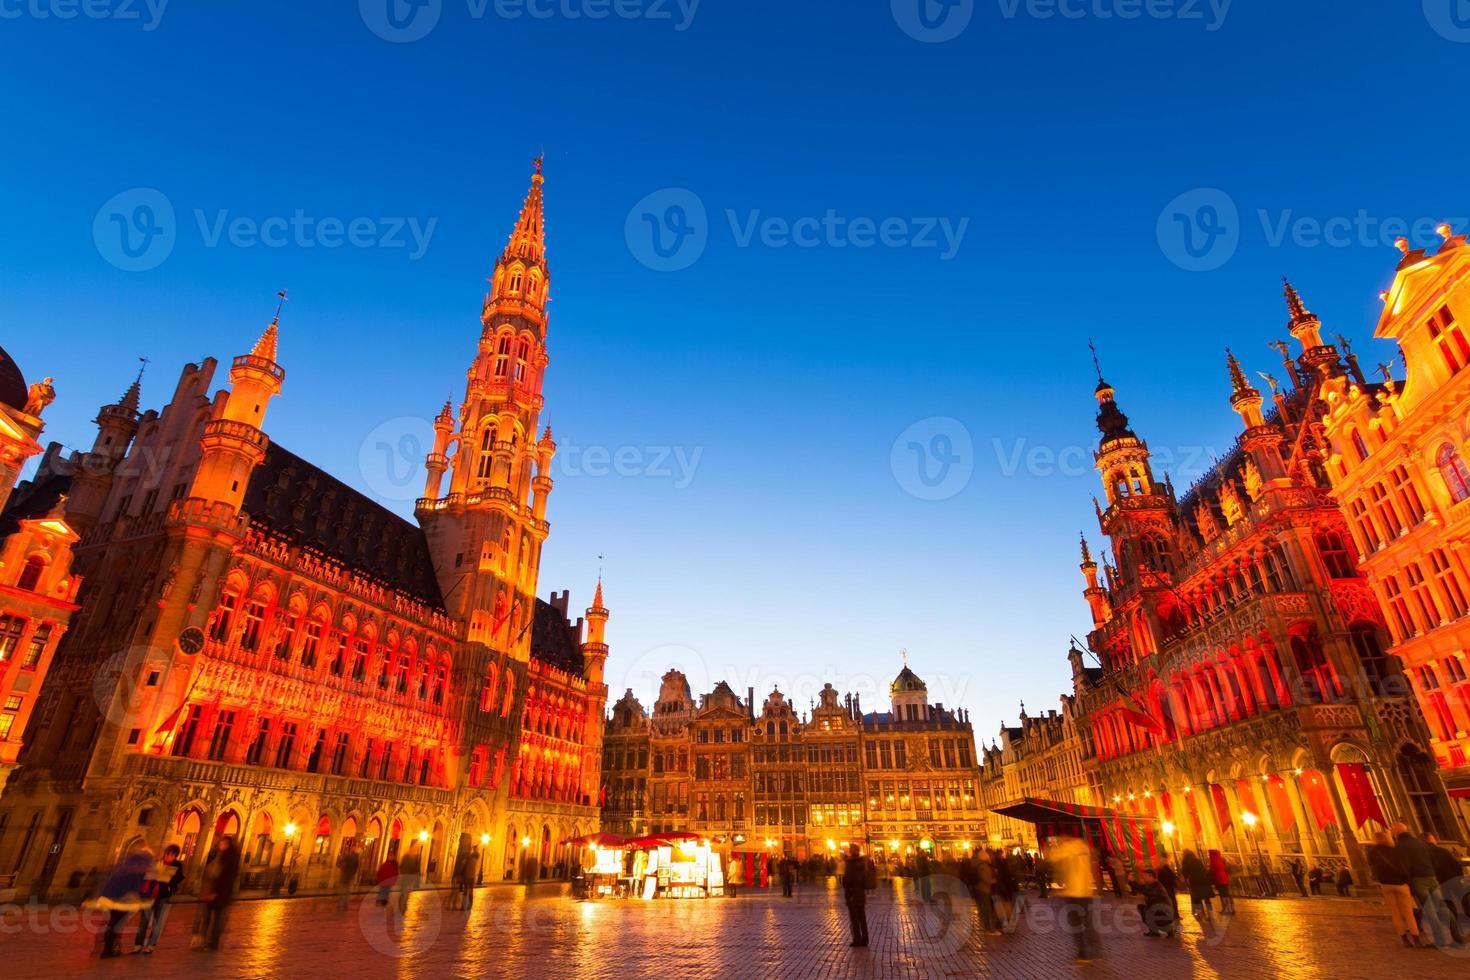 grote markt, bruxelles, belgique, europe. photo